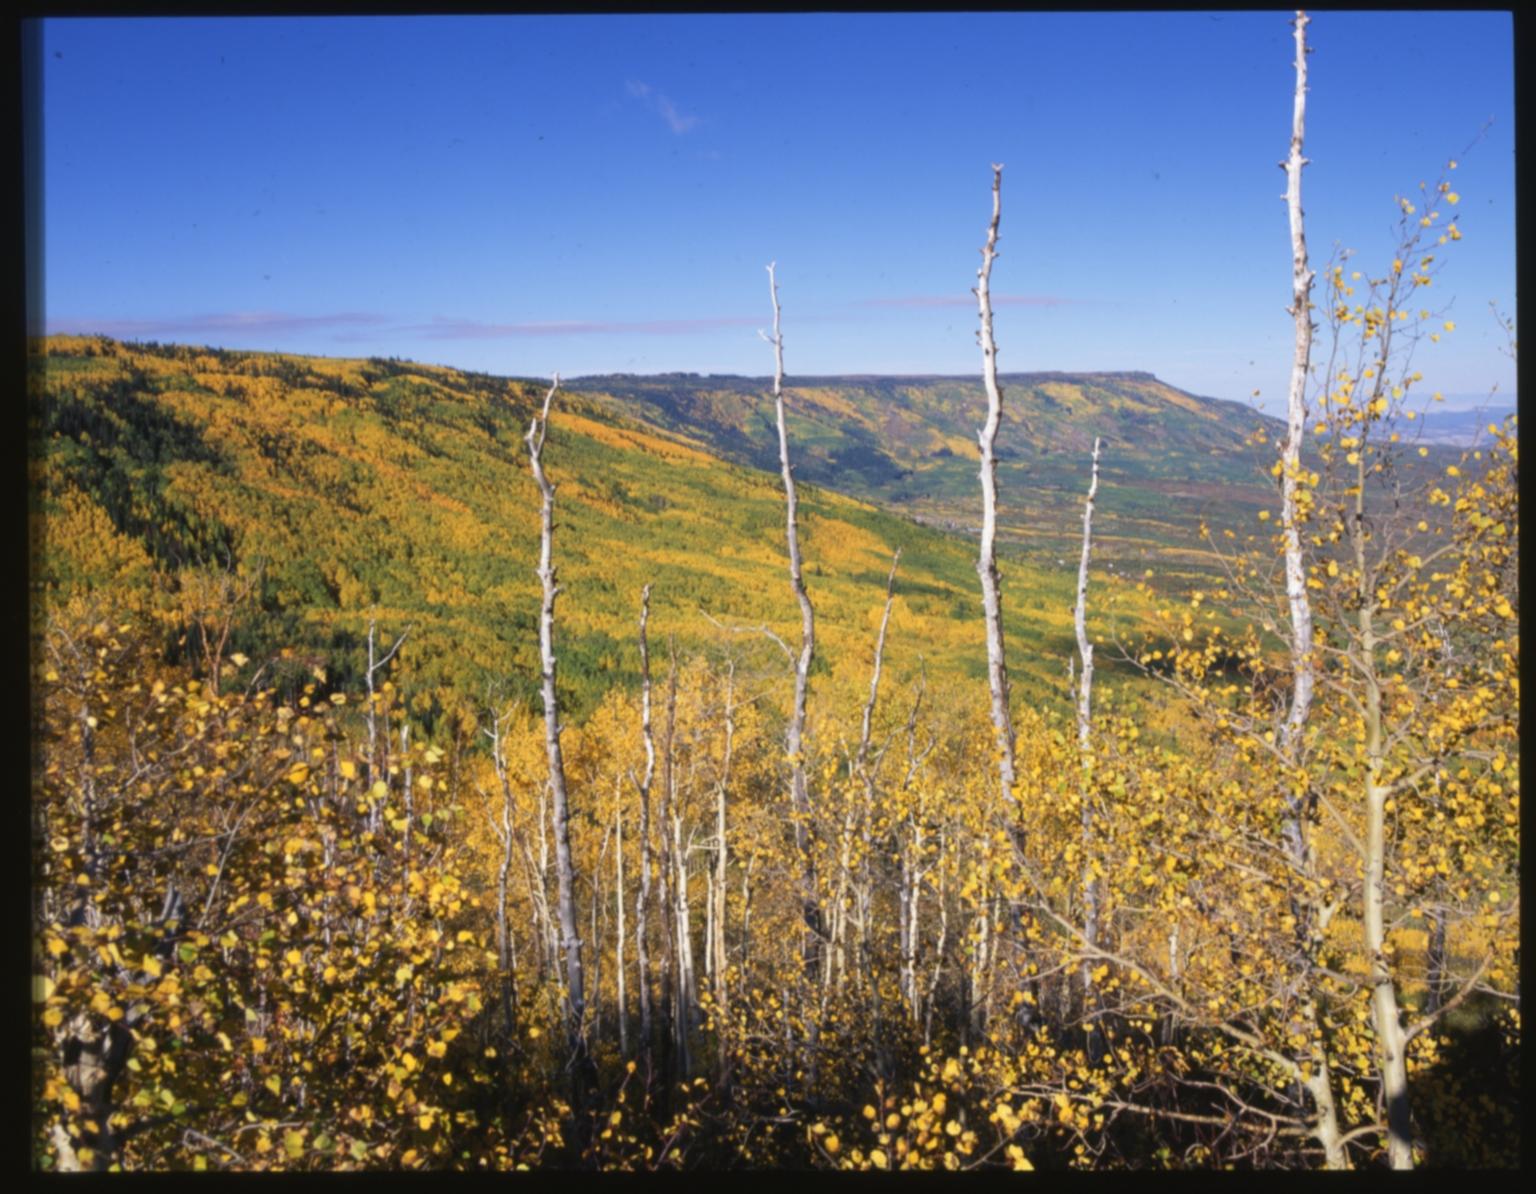 Flat Tops Wilderness Area